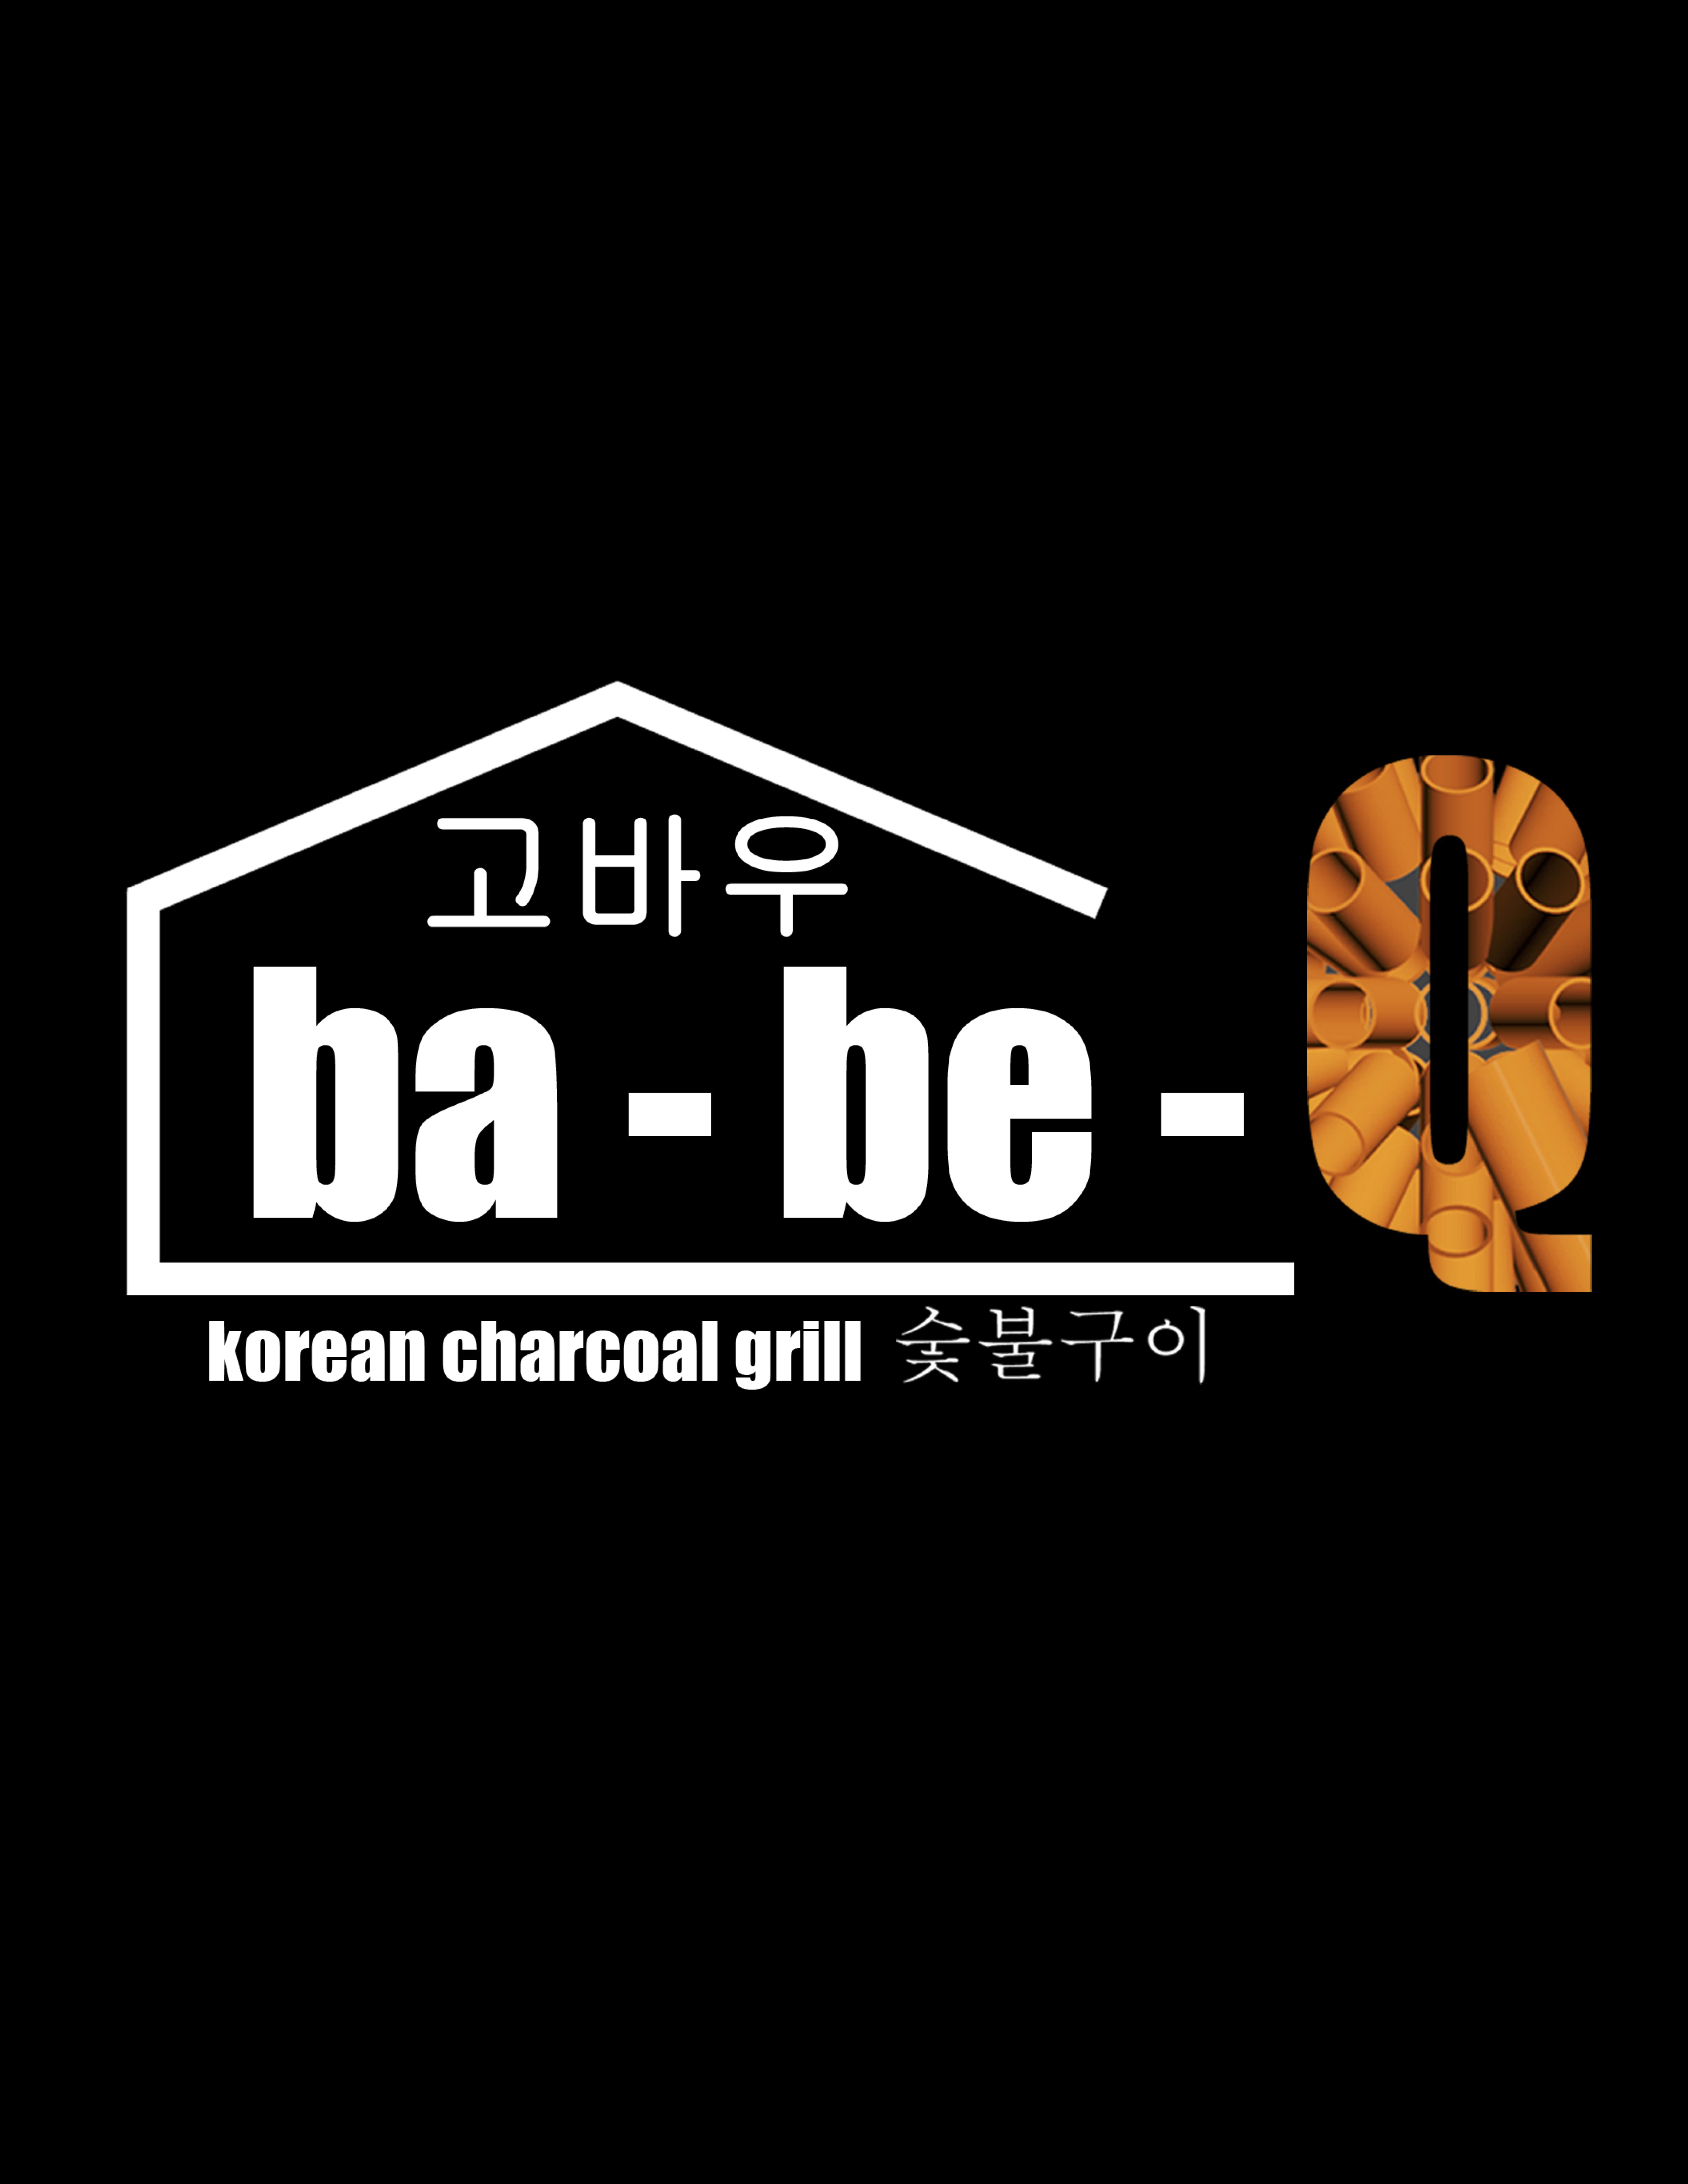 Ba-Be-Q Korean Charcoal Grill brand logo